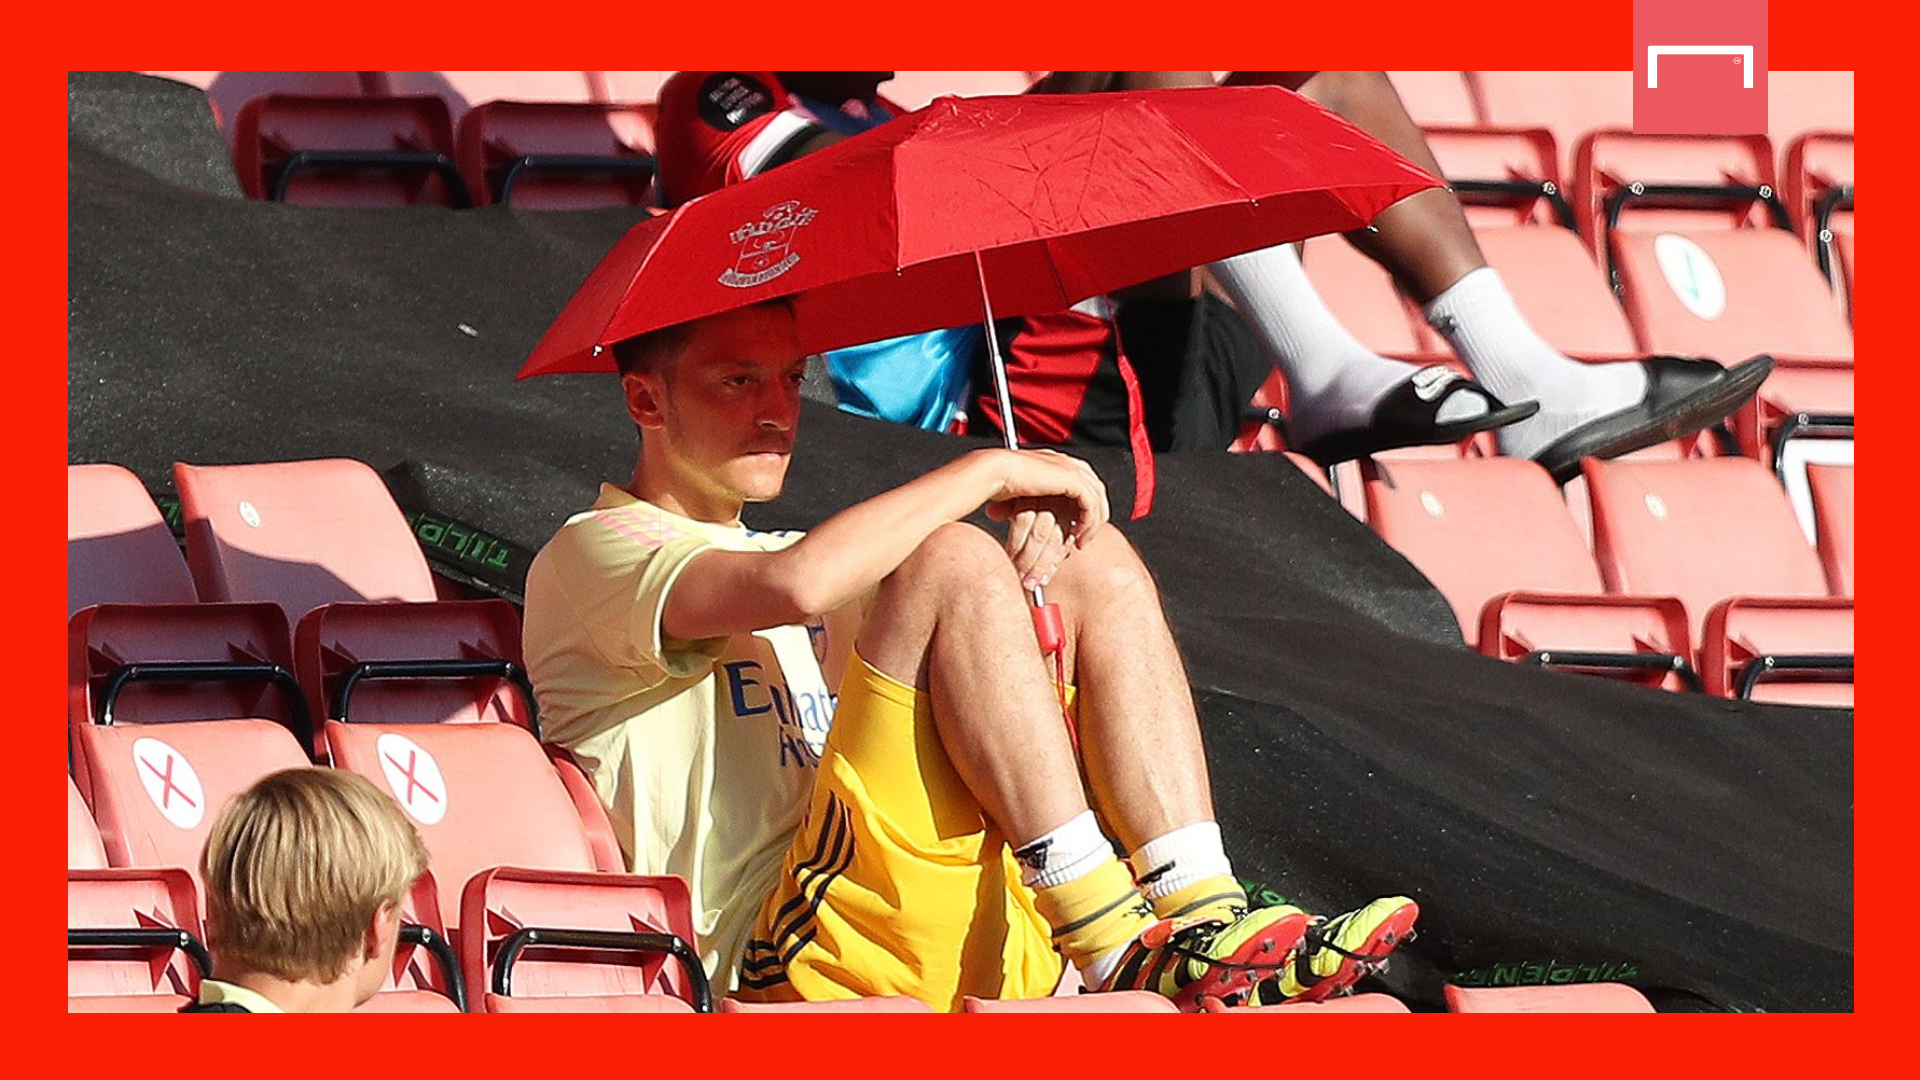 Shkodran Mustafi to miss FA Cup final with hamstring injury